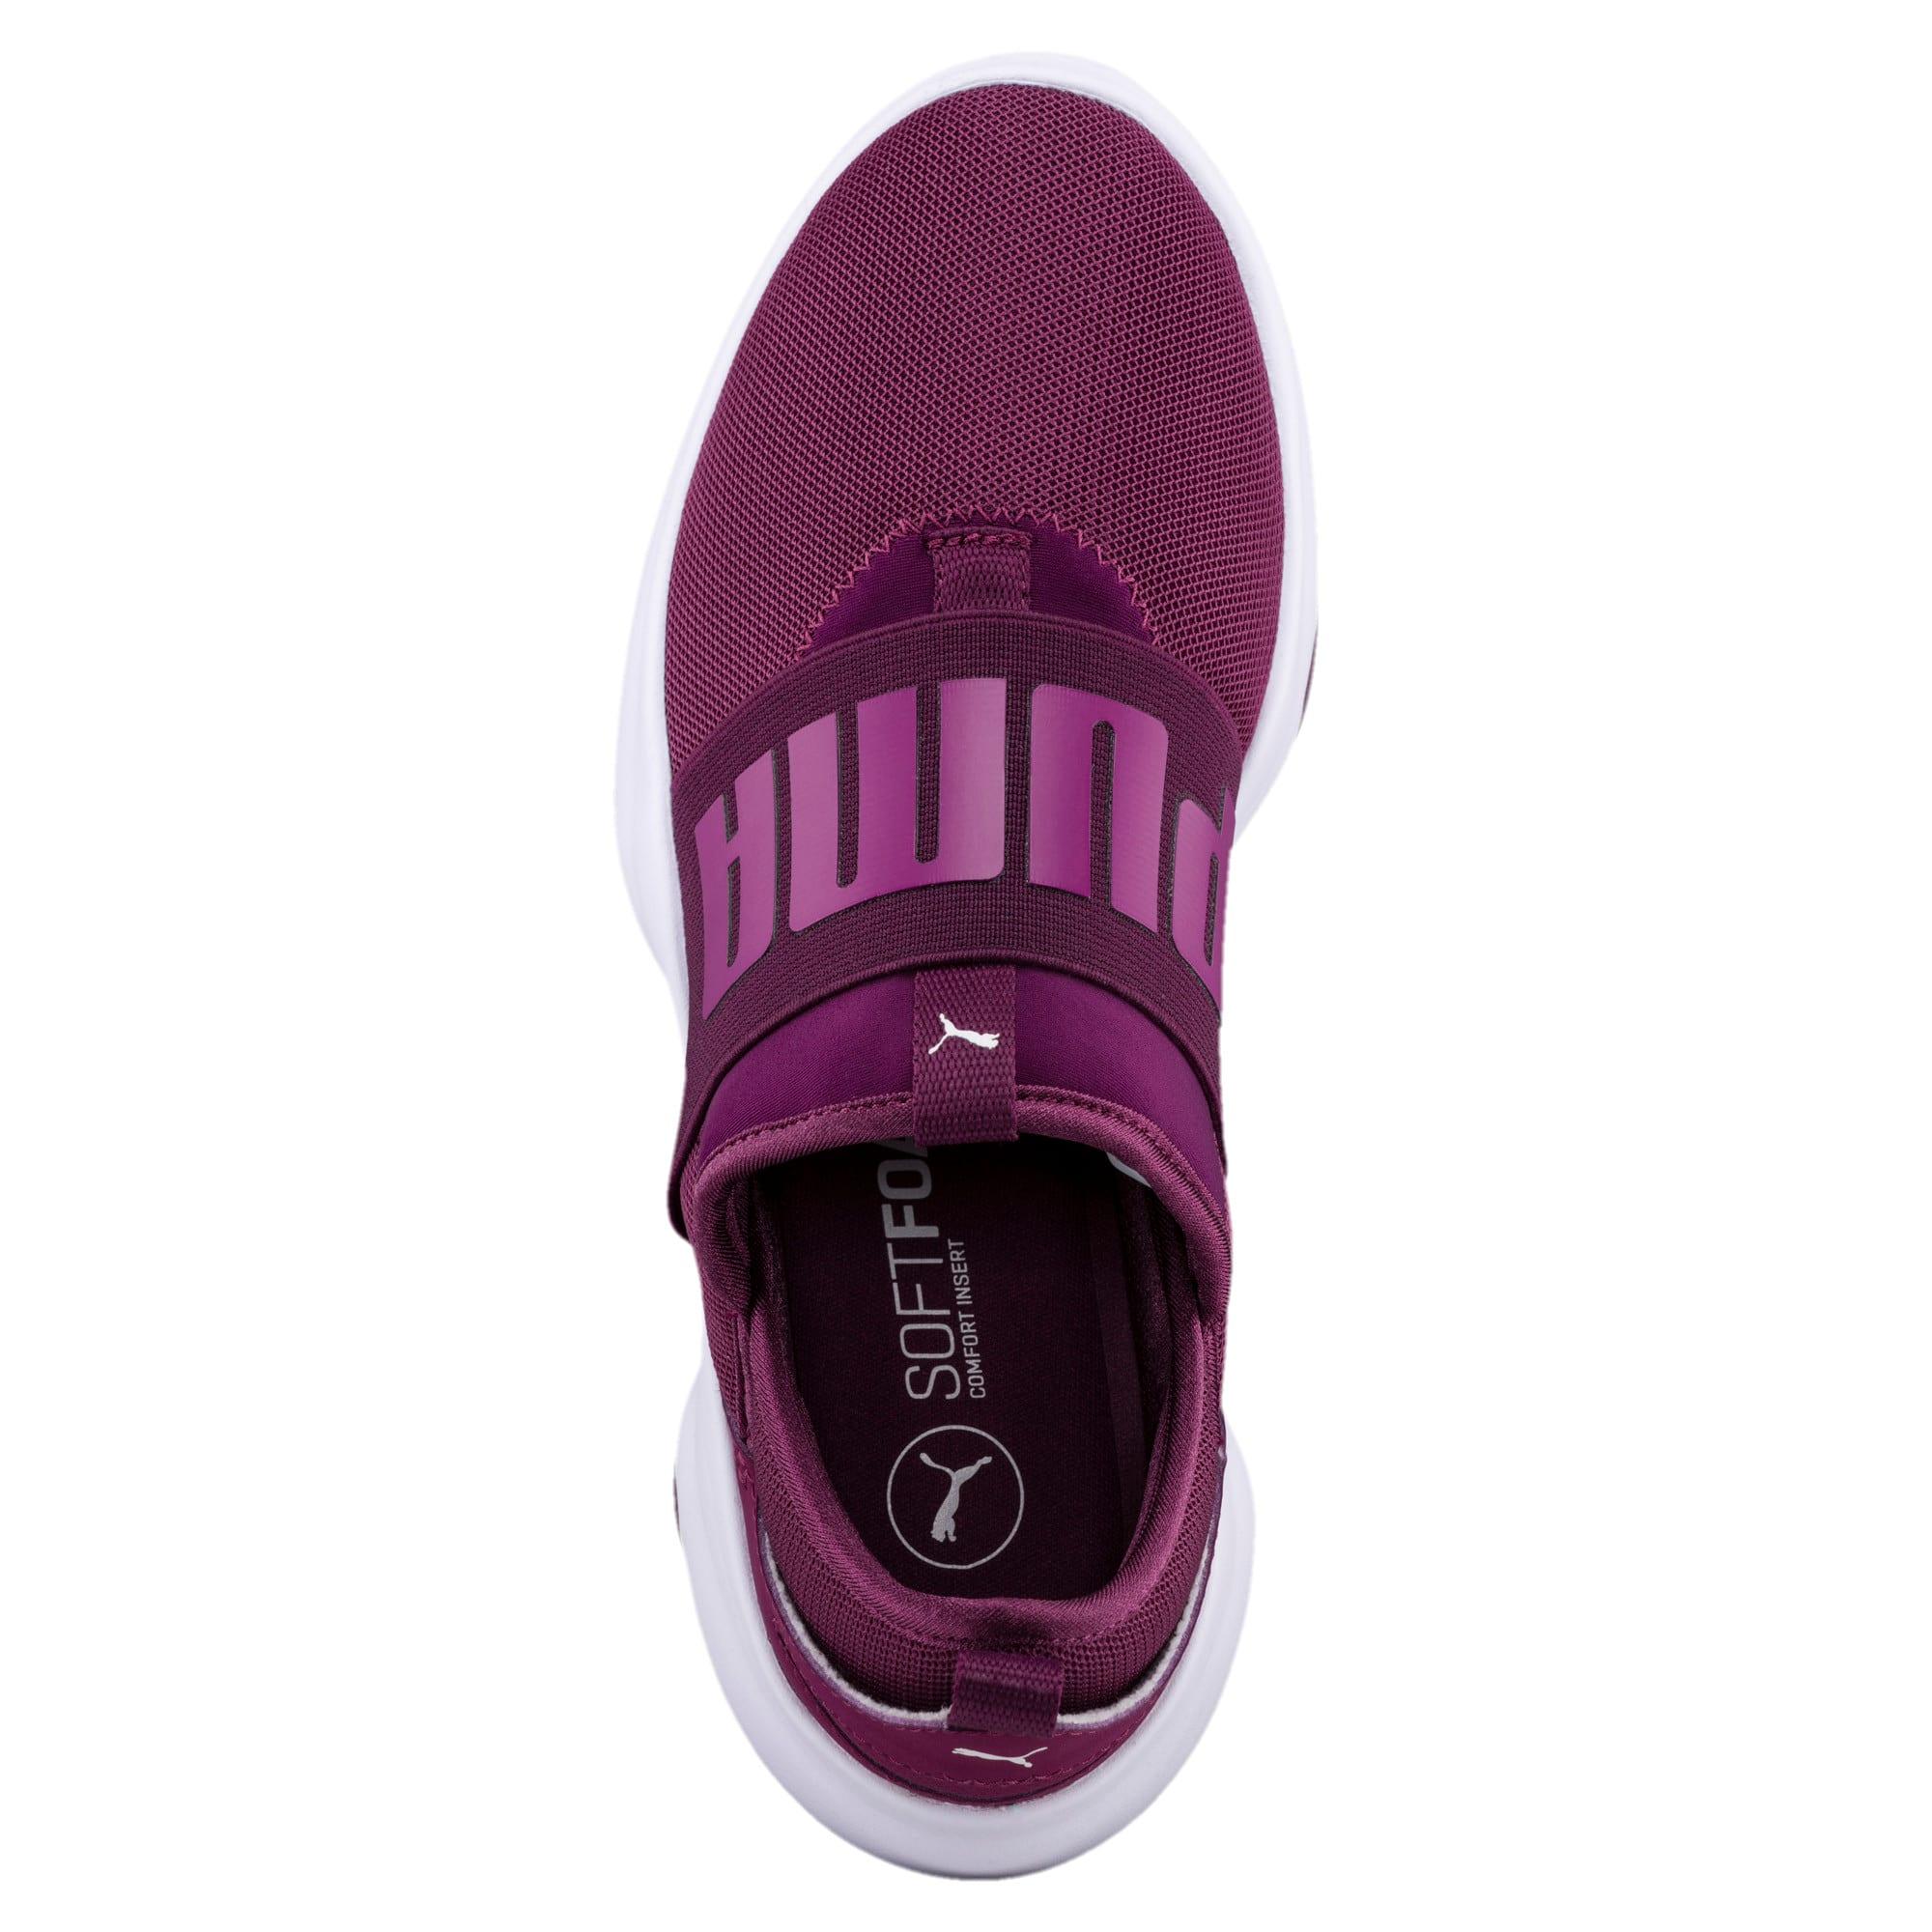 Thumbnail 5 of Dare Unisex Training Shoes, Dark Purple-Dark Purple, medium